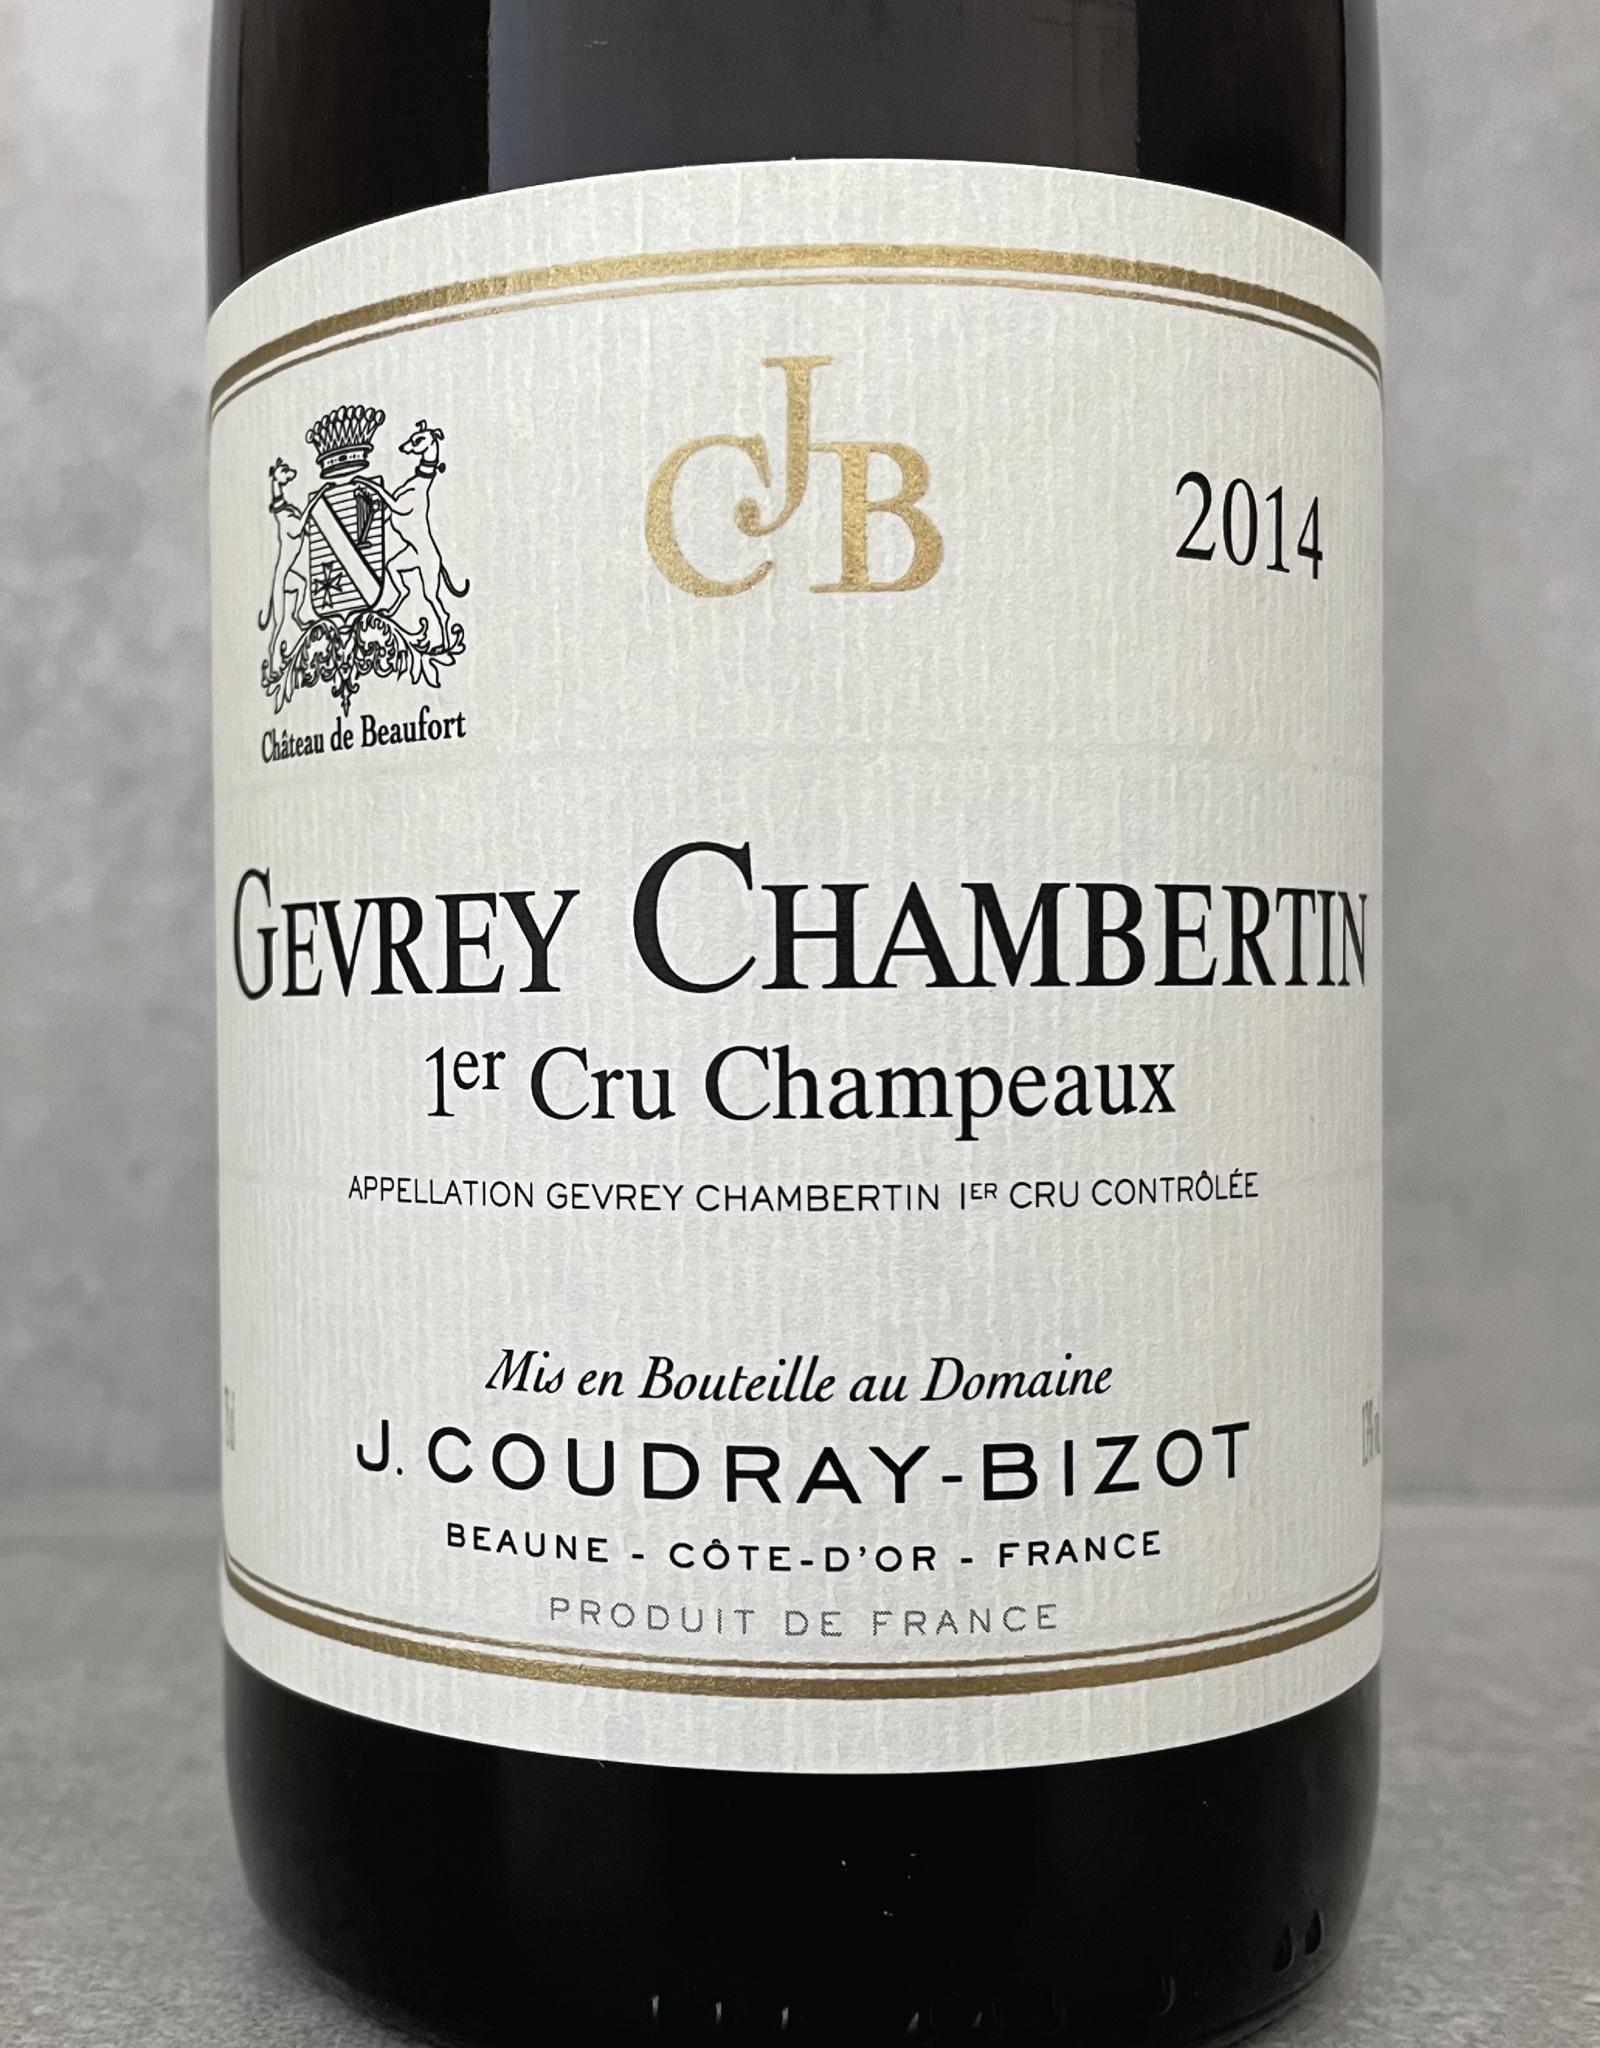 Domaine Coudray-Bizot Gevrey Chambertin 1er Cru Champeaux 2014